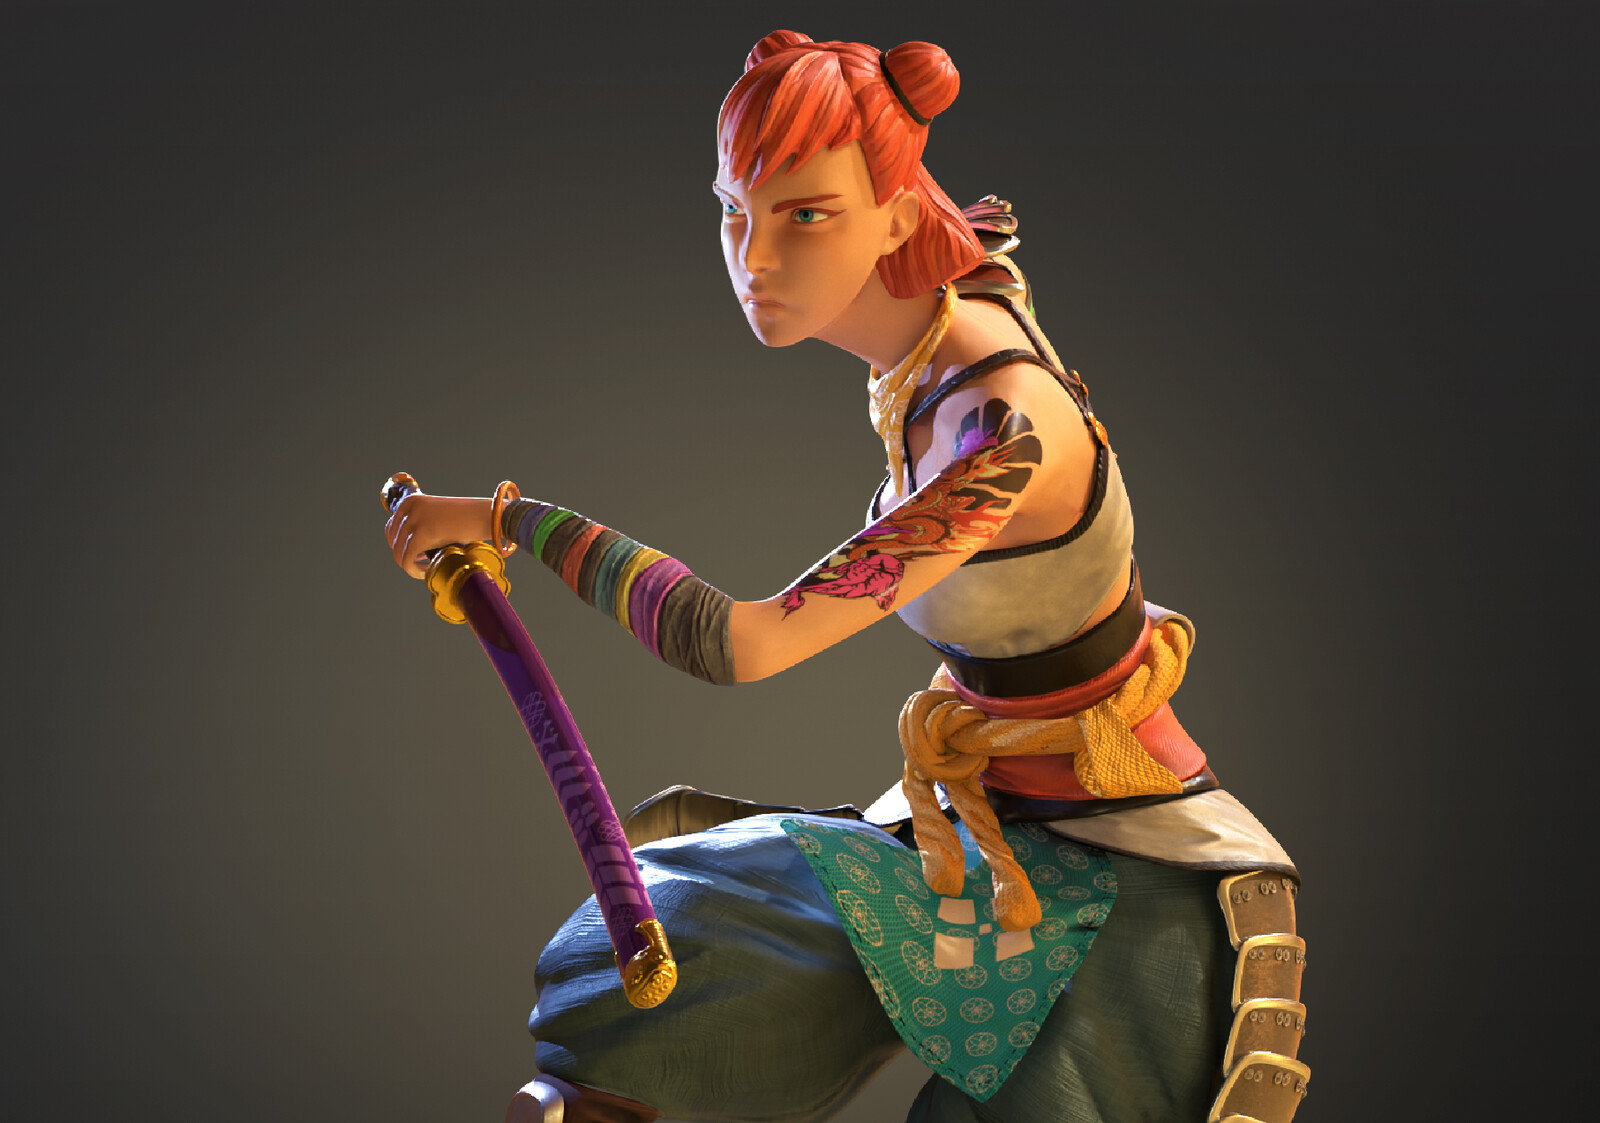 Akiyo The Samurai Girl